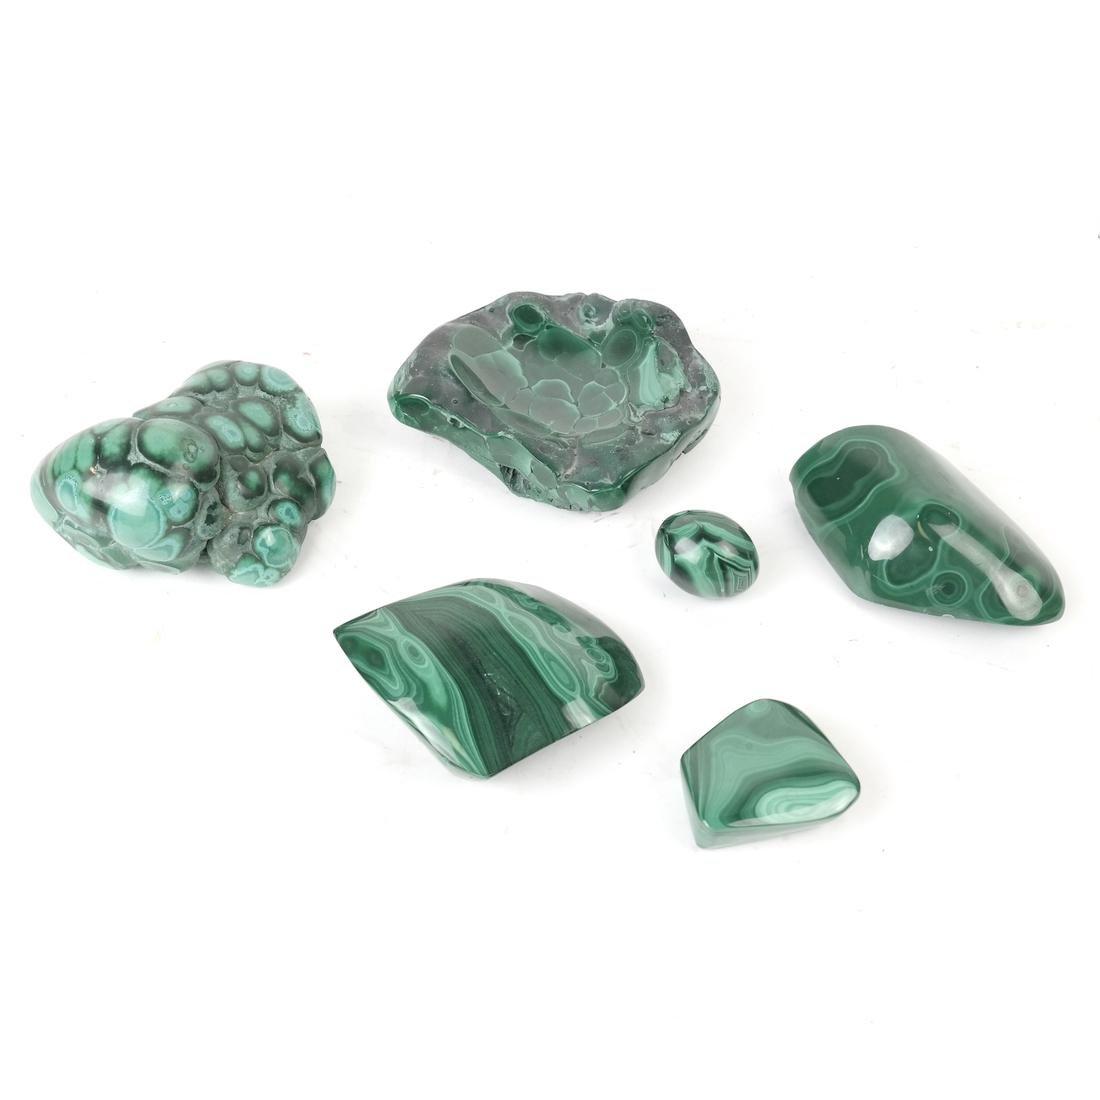 6 Pieces Polished Malachite